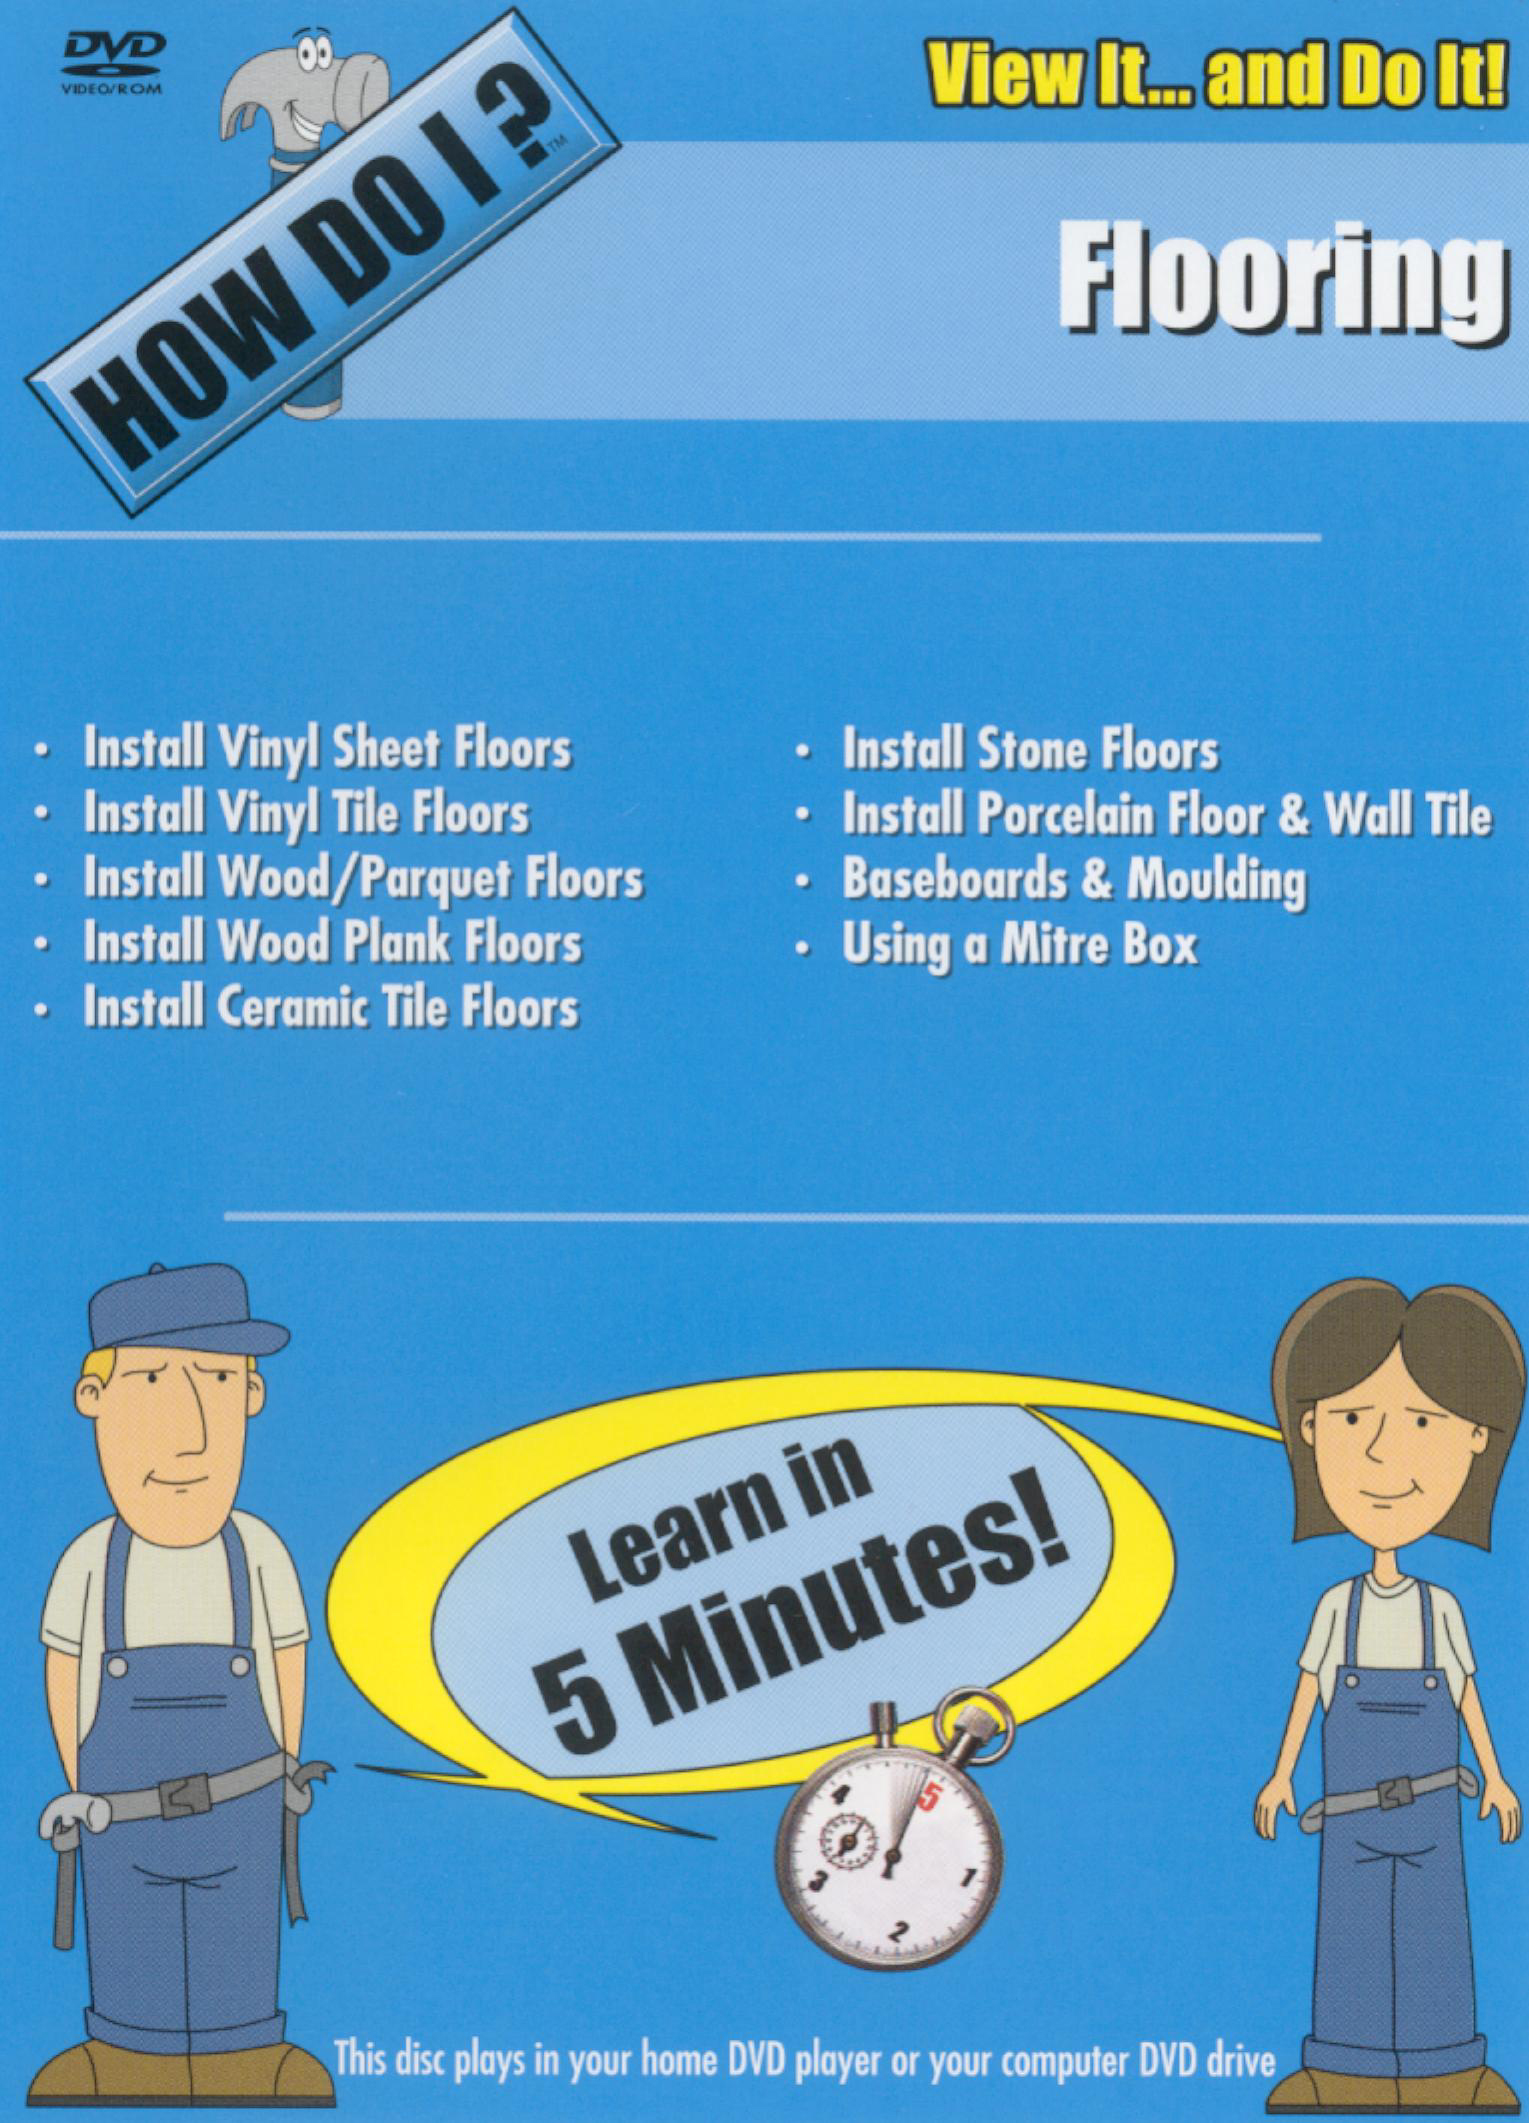 How Do I: Flooring